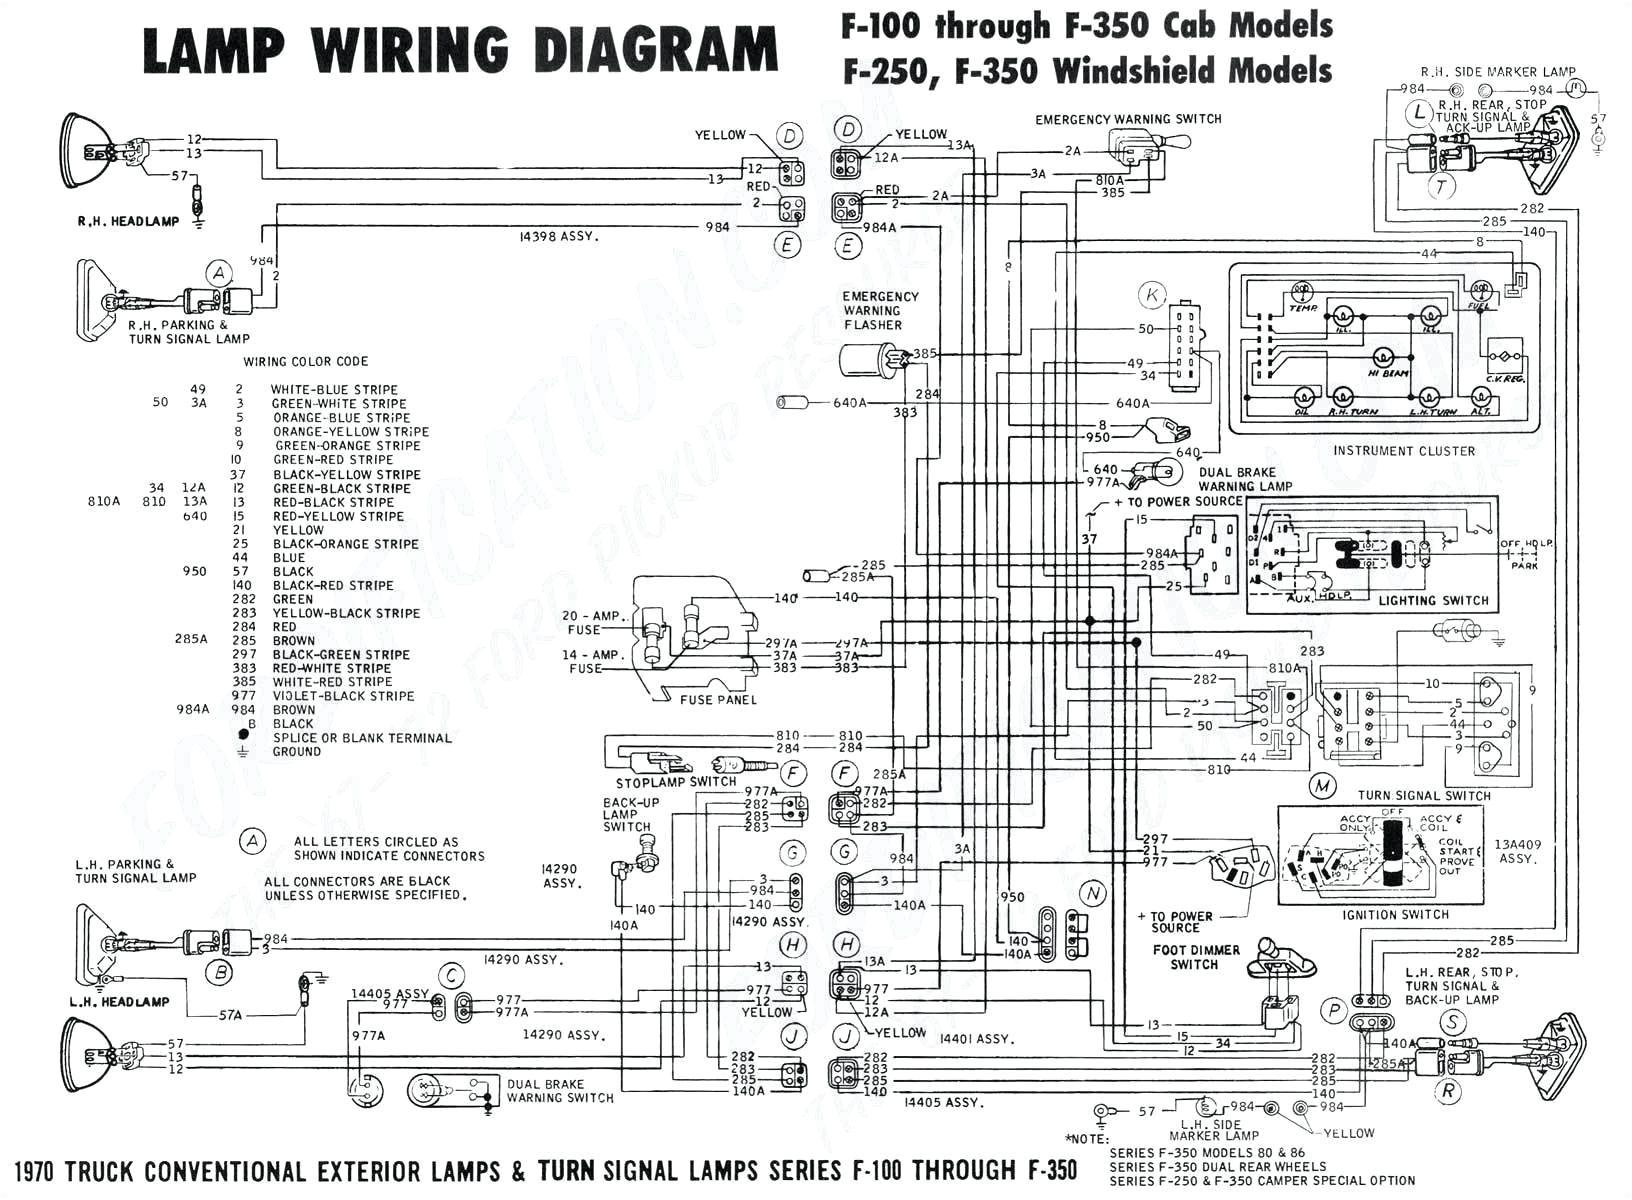 Yj Tail Light Wiring Diagram Jeep Cj Tail Light Wiring Wiring Diagram View